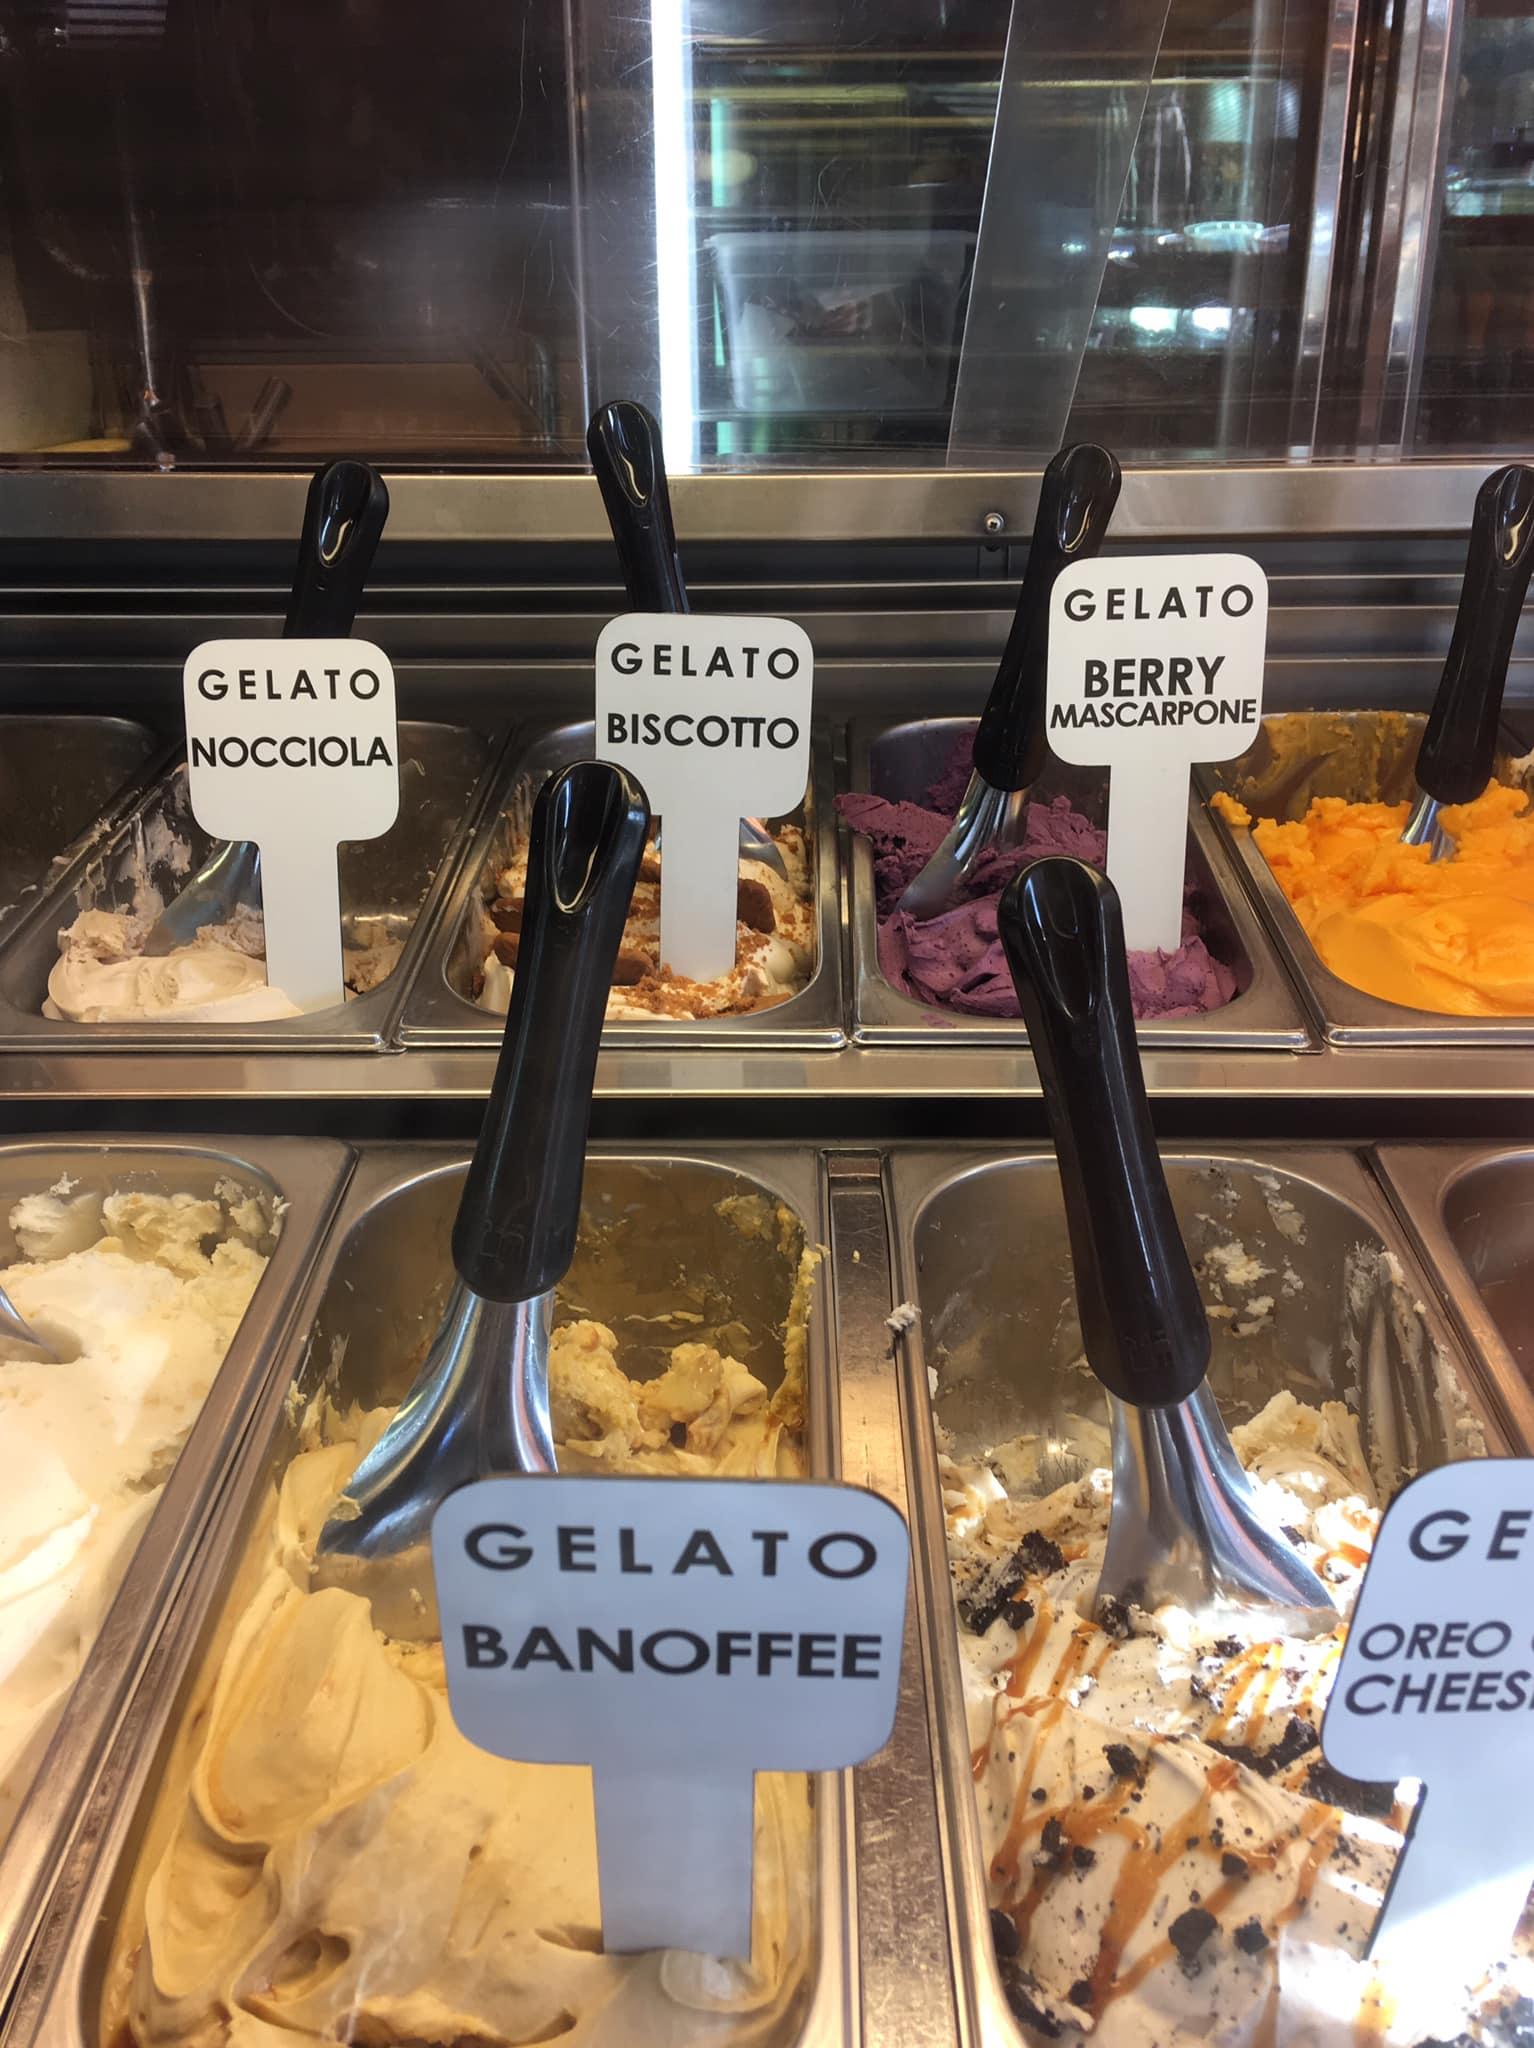 Zillion's: Βρήκαμε που θα φας το πιο νόστιμο παγωτό της πόλης